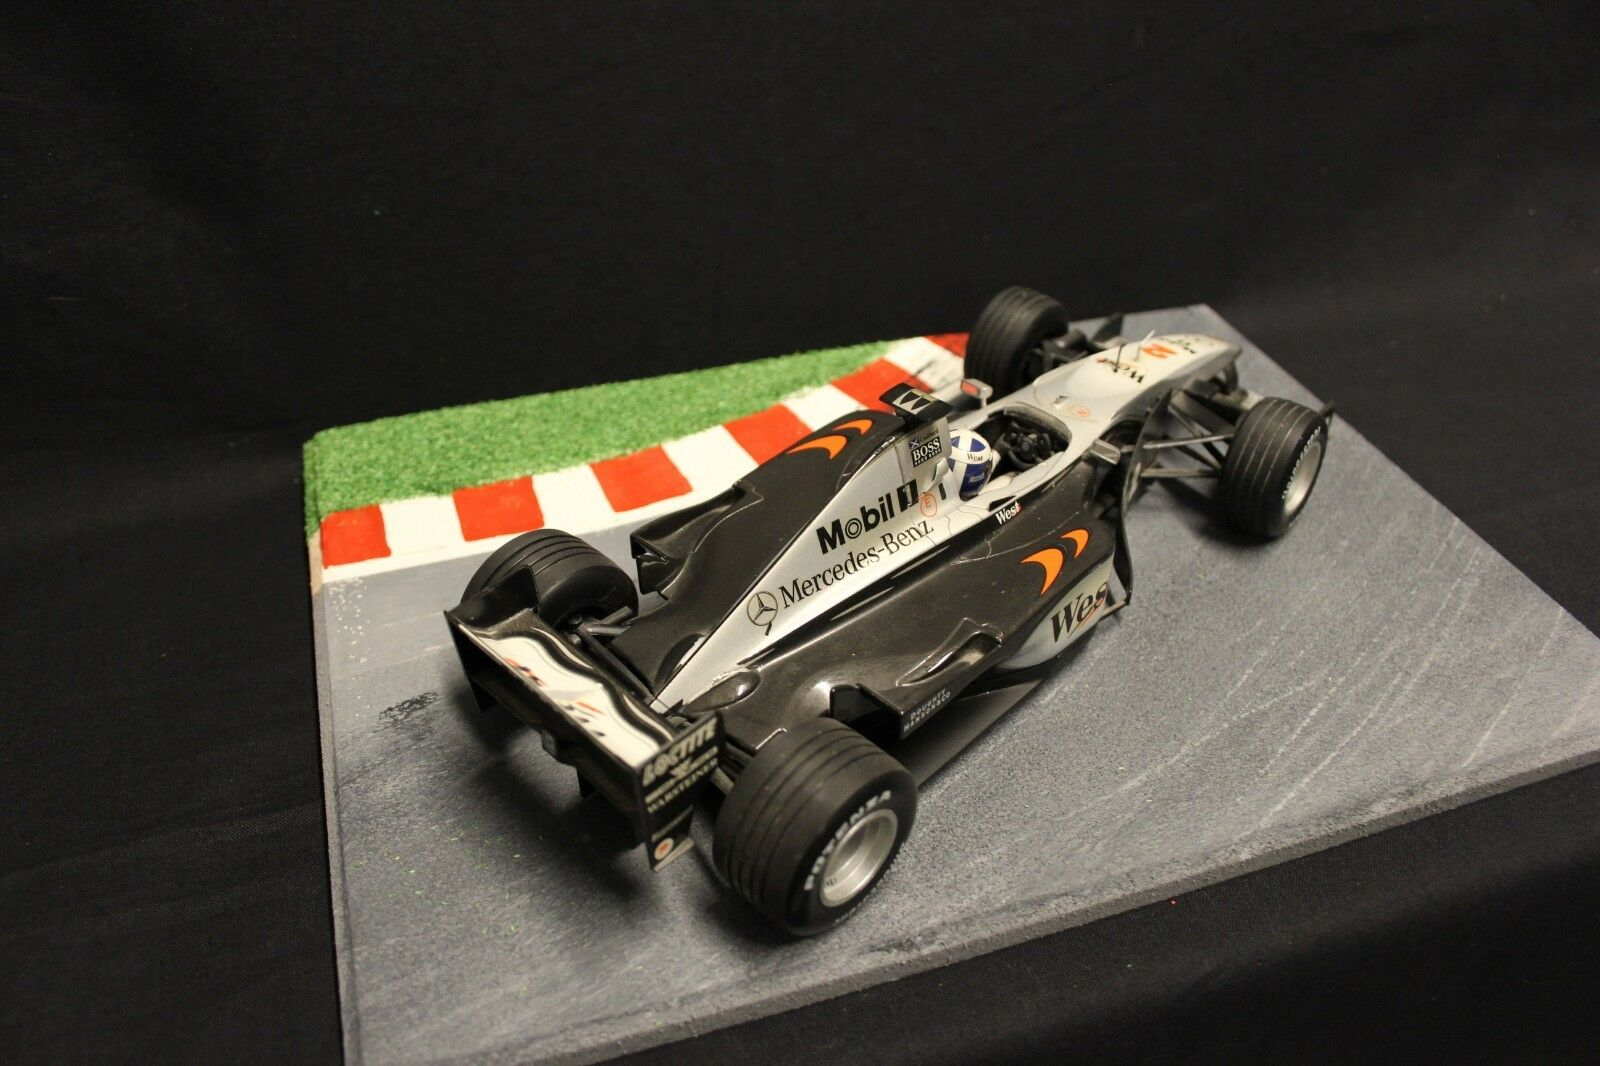 Minichamps McLaren Mercedes MP4-14 1999 1 18 David David David Coulthard (GBR) (F1NB) 5362a0